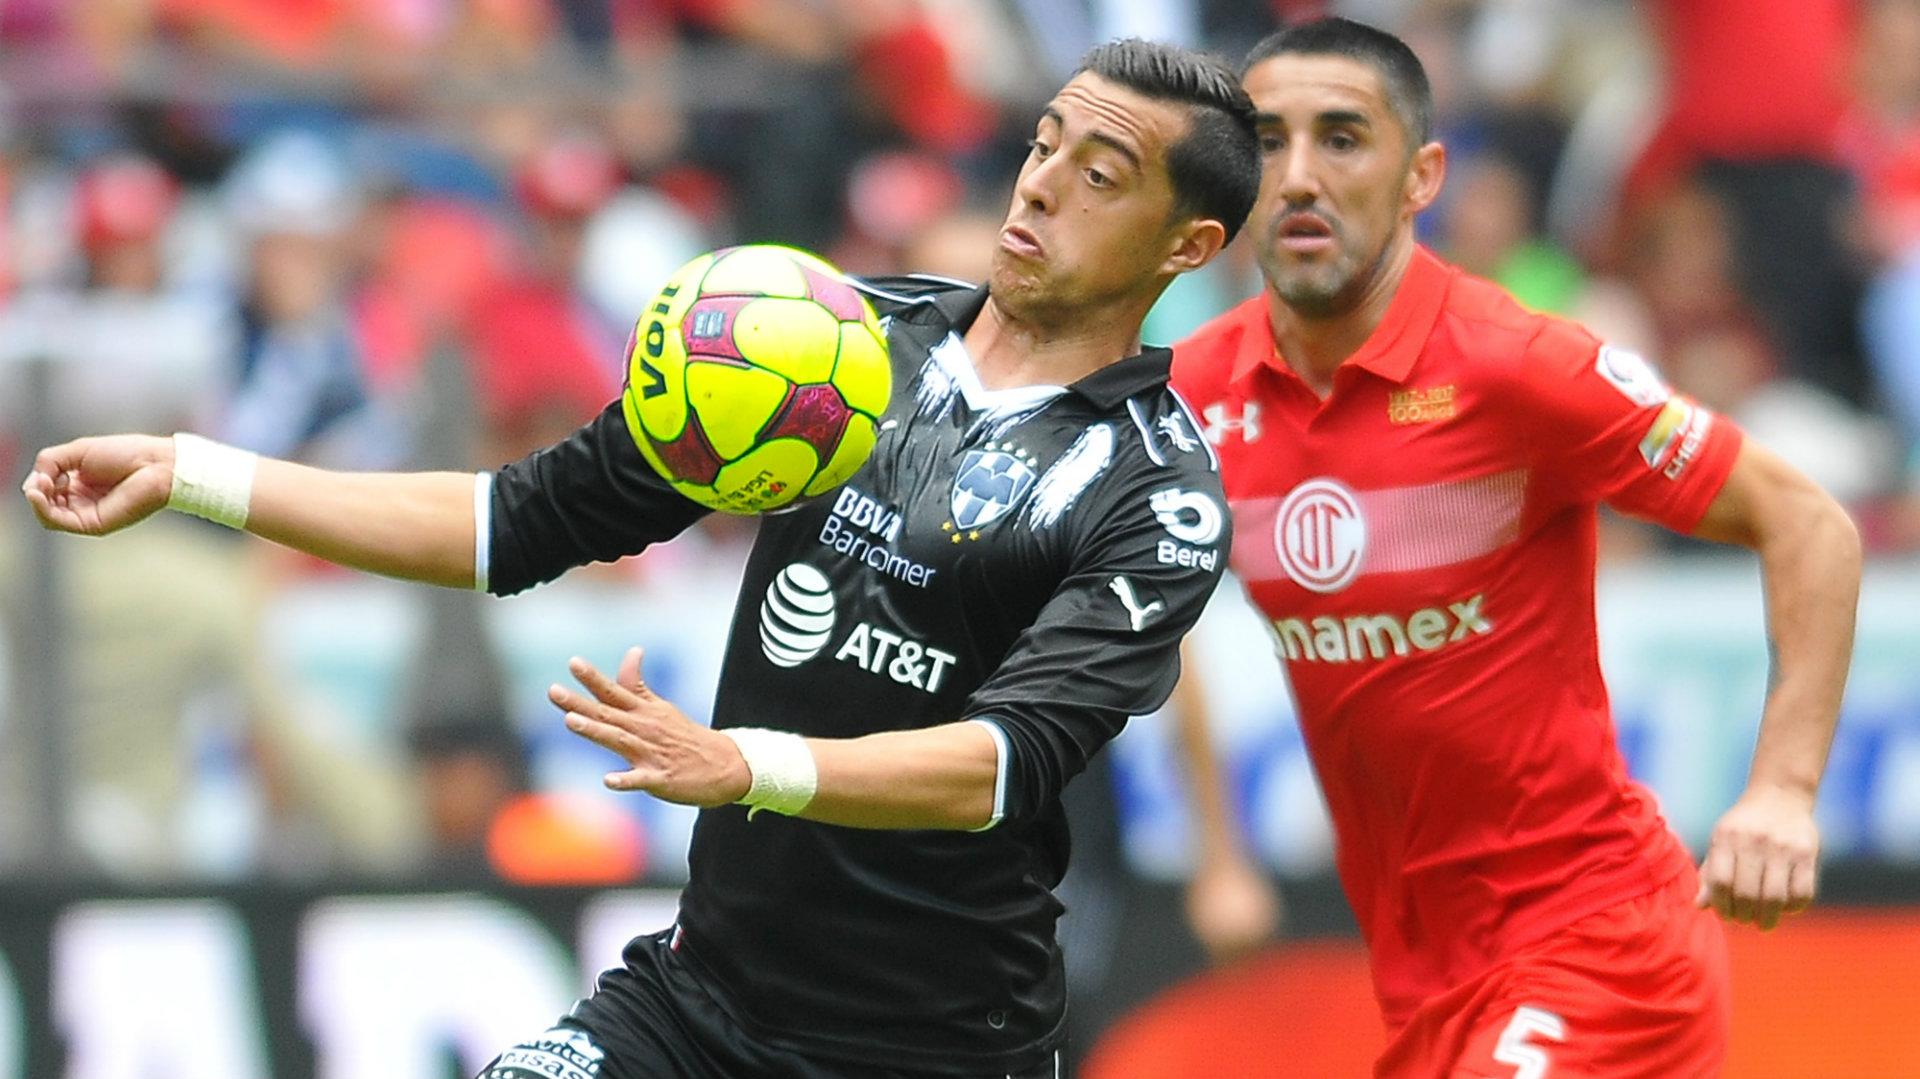 Rogelio Funes Mori Monterrey Osvaldo Gonzalez Toluca